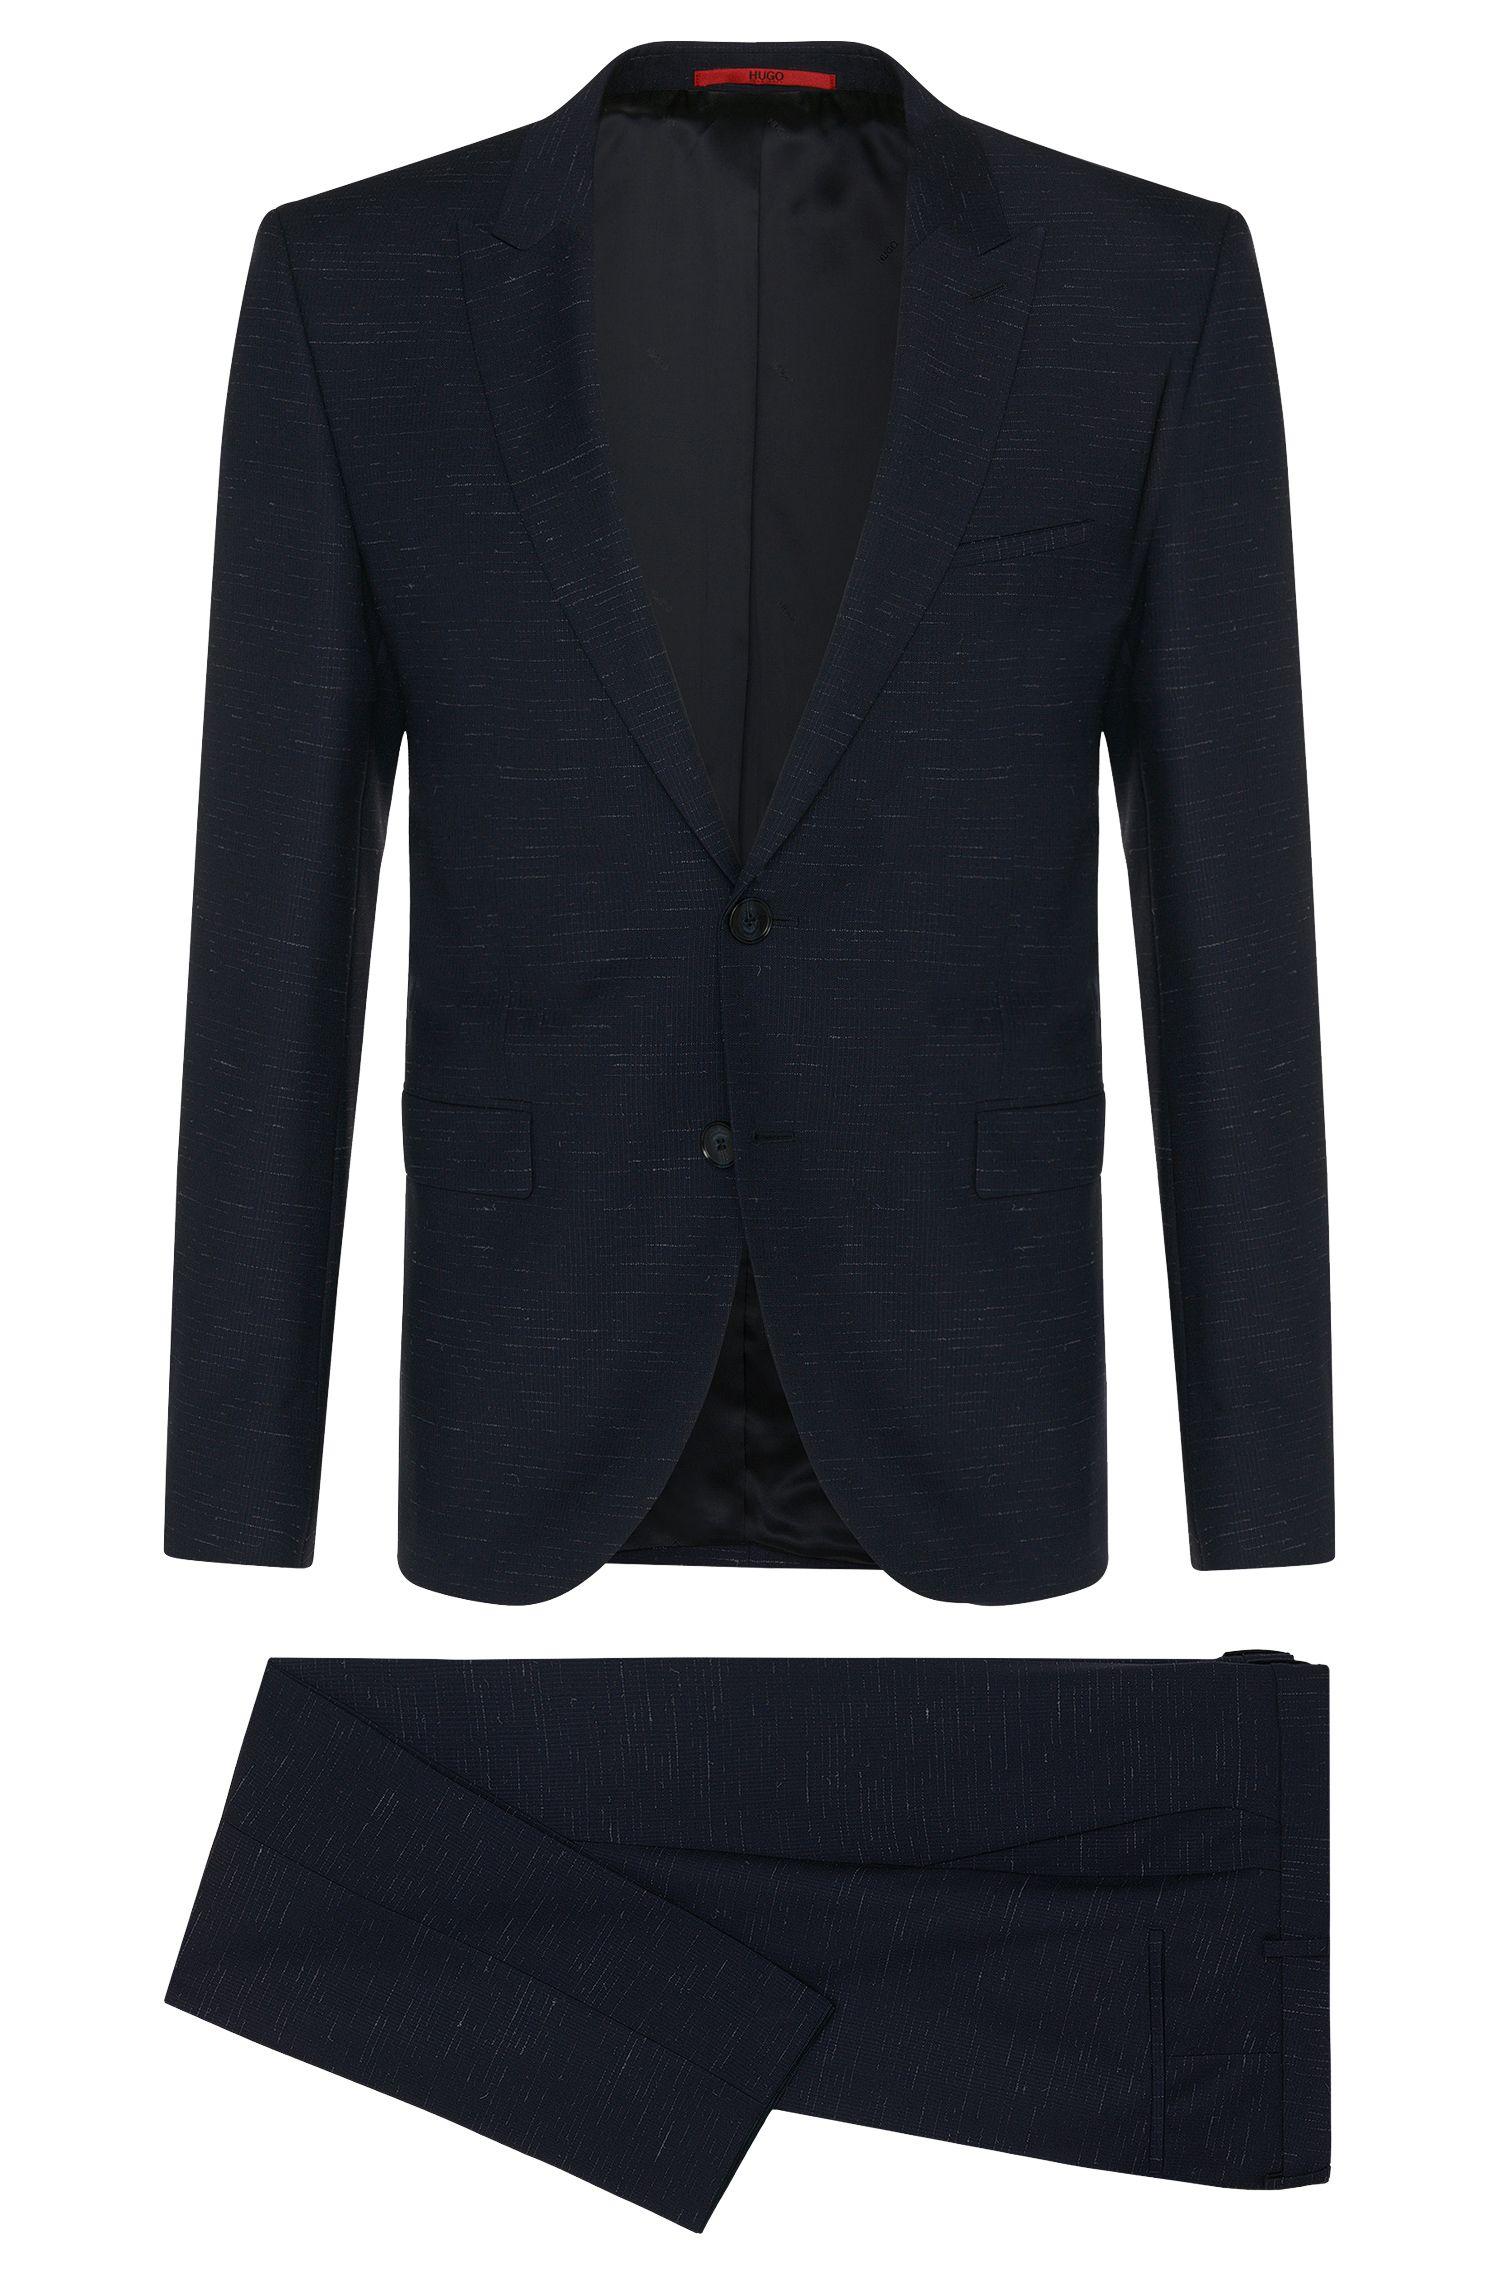 'Astor/Hends'   Extra Slim Fit, Super 110 Virgin Wool Suit